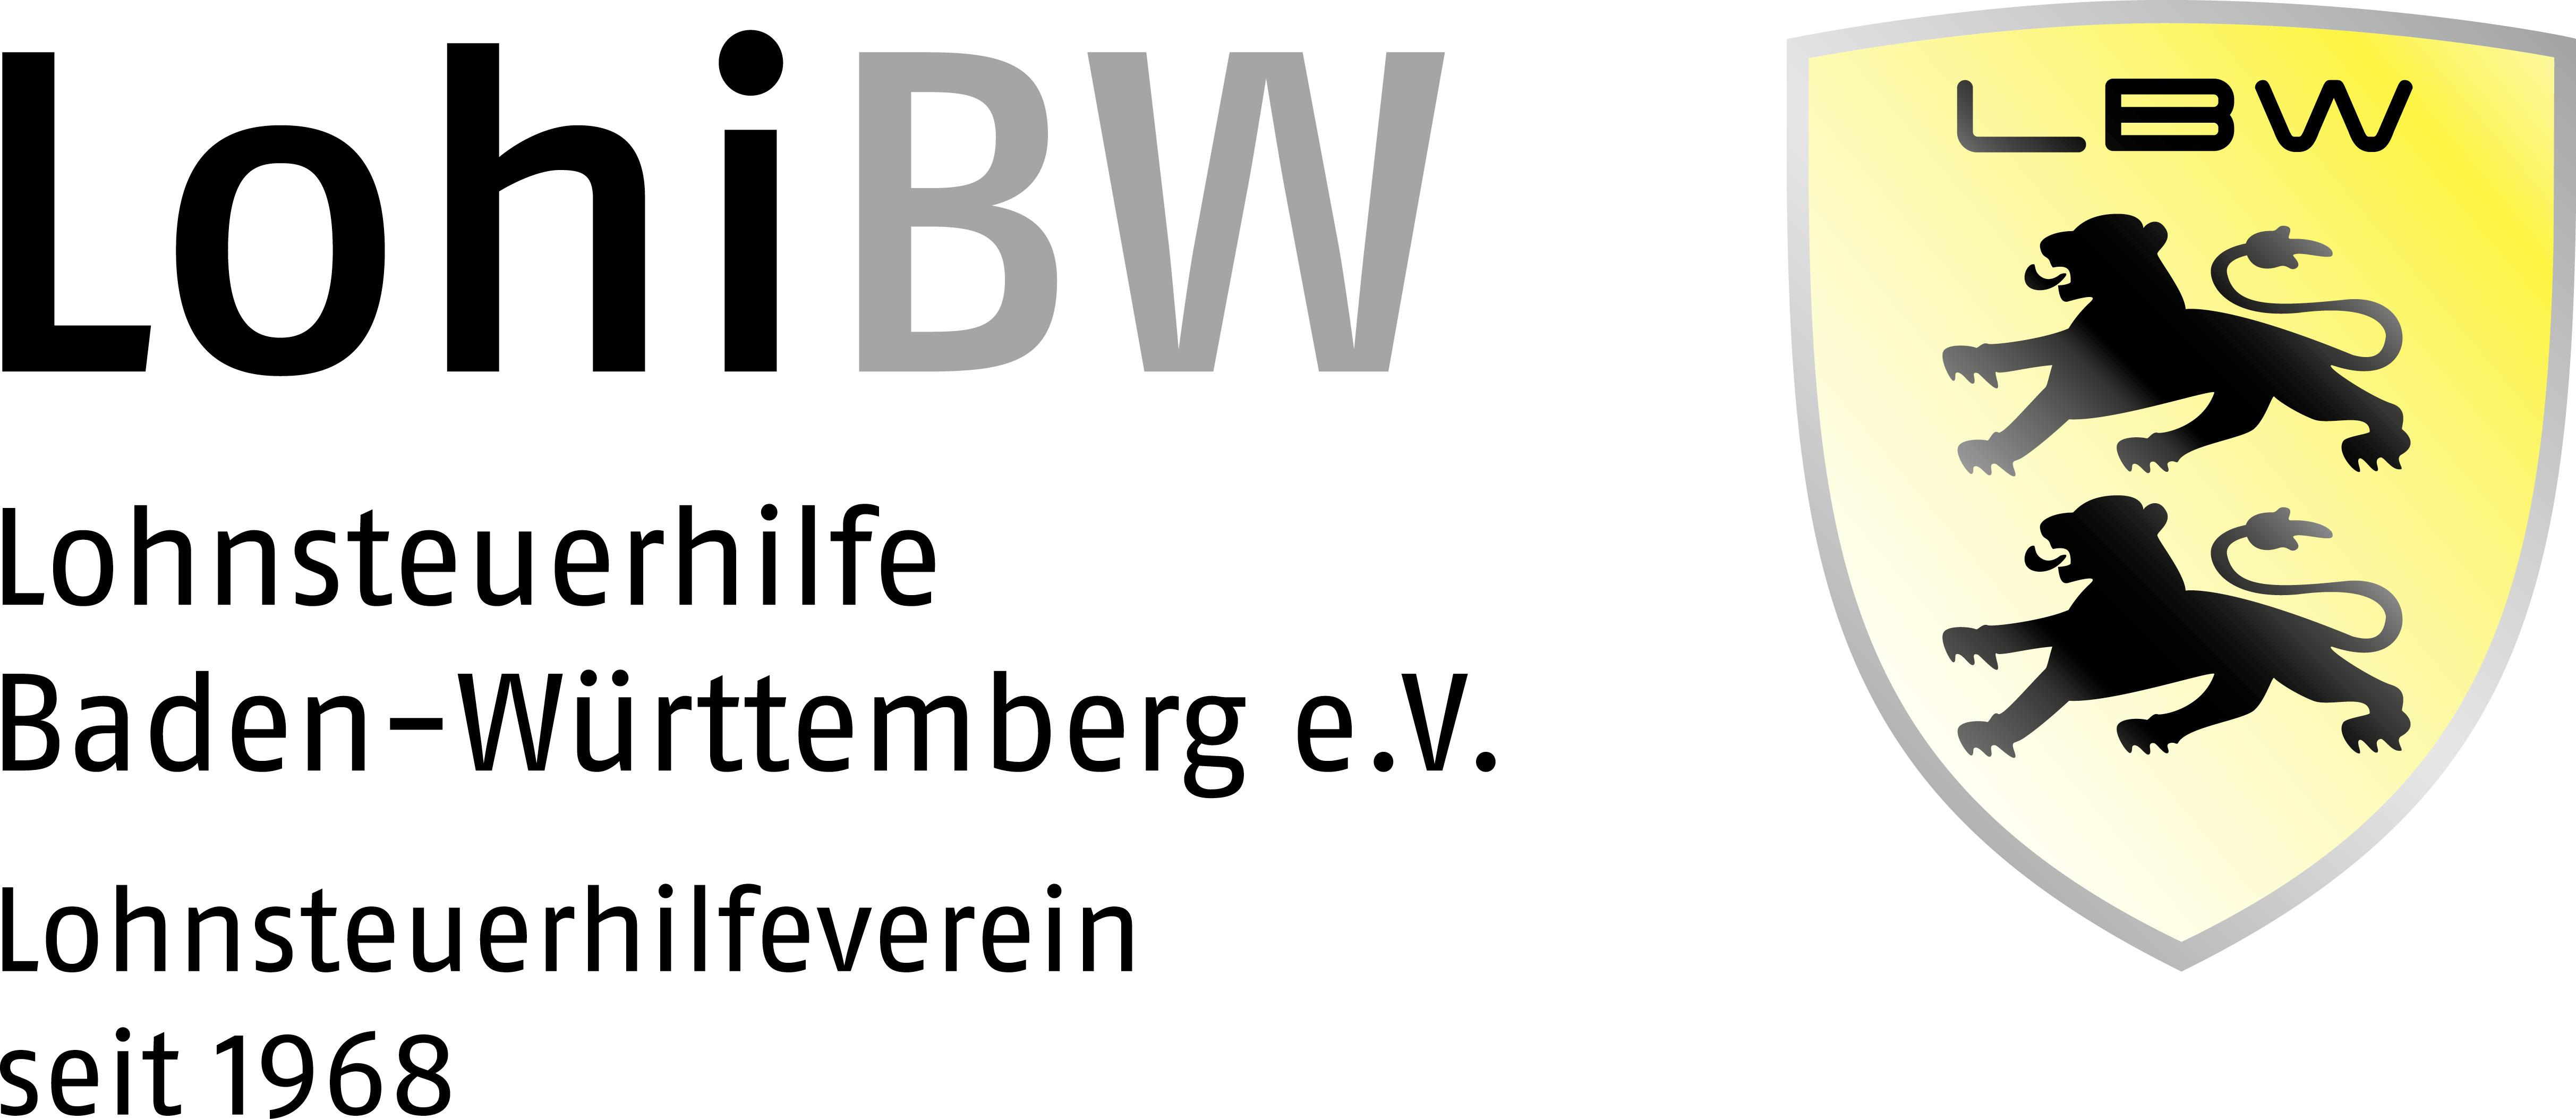 LohiBW Beratungsstelle Stuttgart - Bad Cannstatt Stuttgart